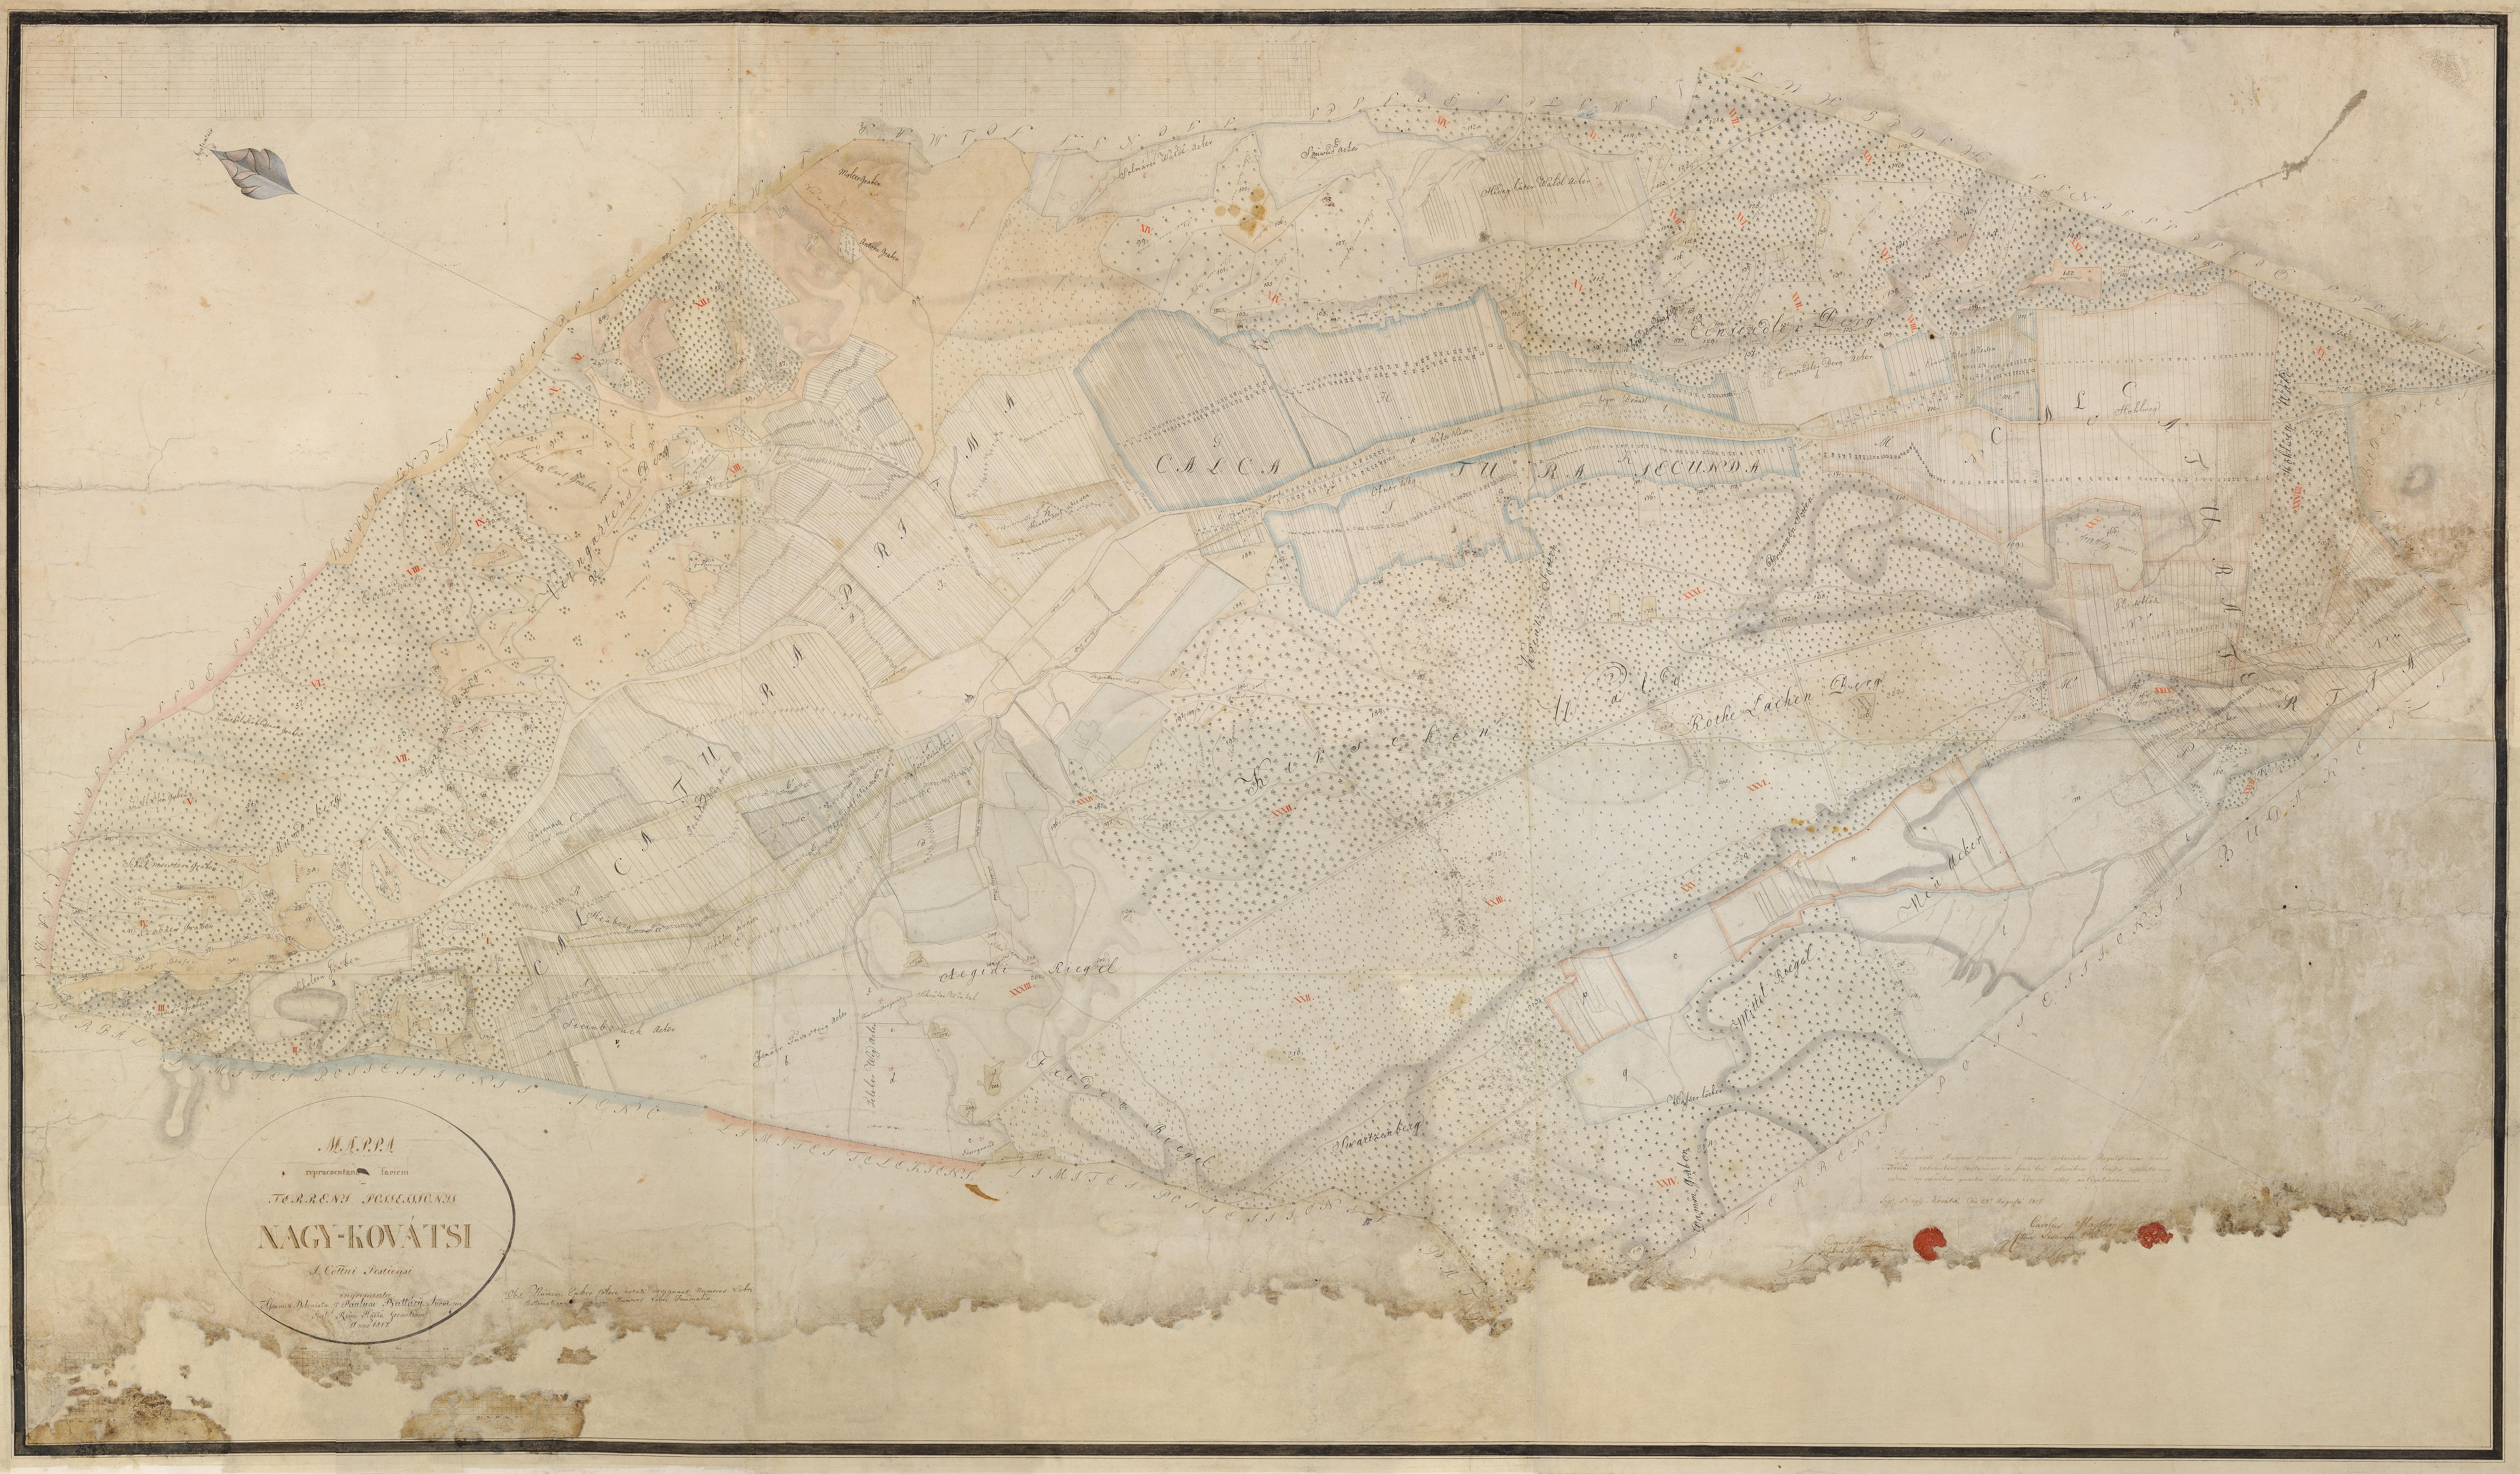 Mappa repraesentaus factem terreny possessionis Nagy- Kovátsi, Birtoktérkép  1817.